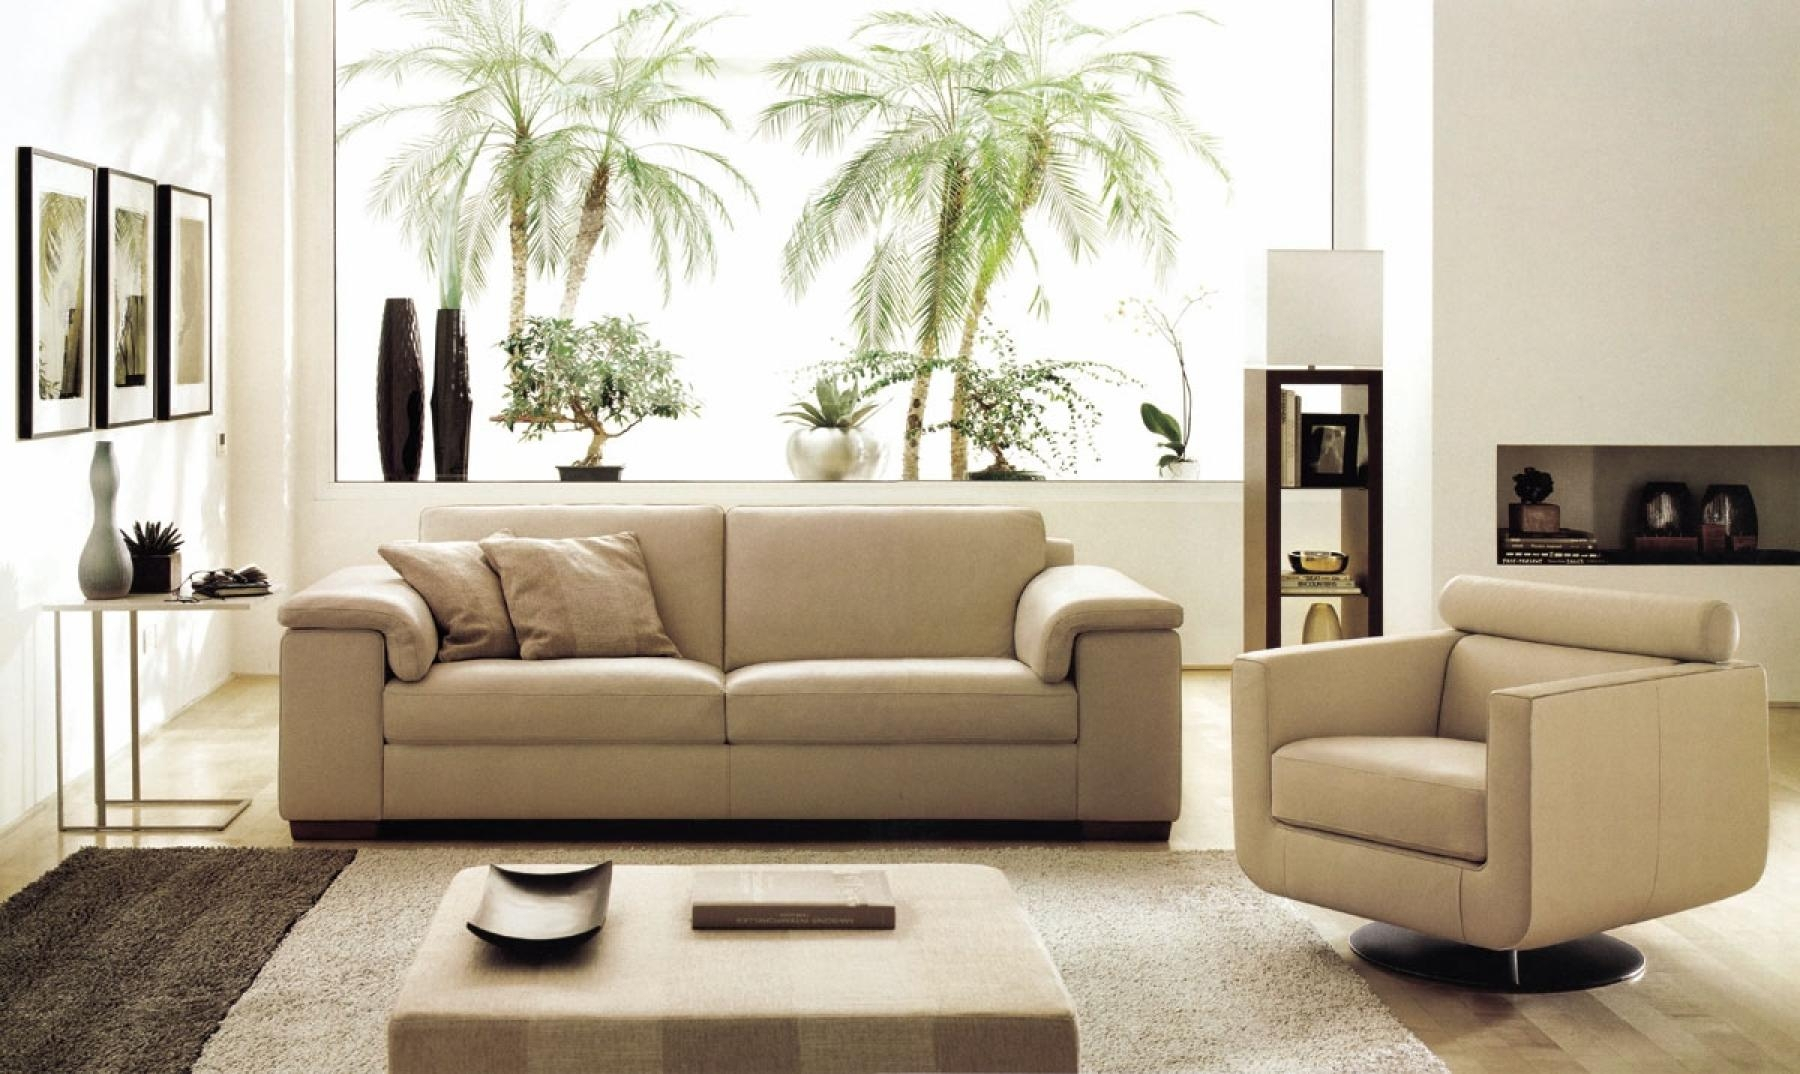 DECO IN PARIS Canape cuir beige 3 places romantica can